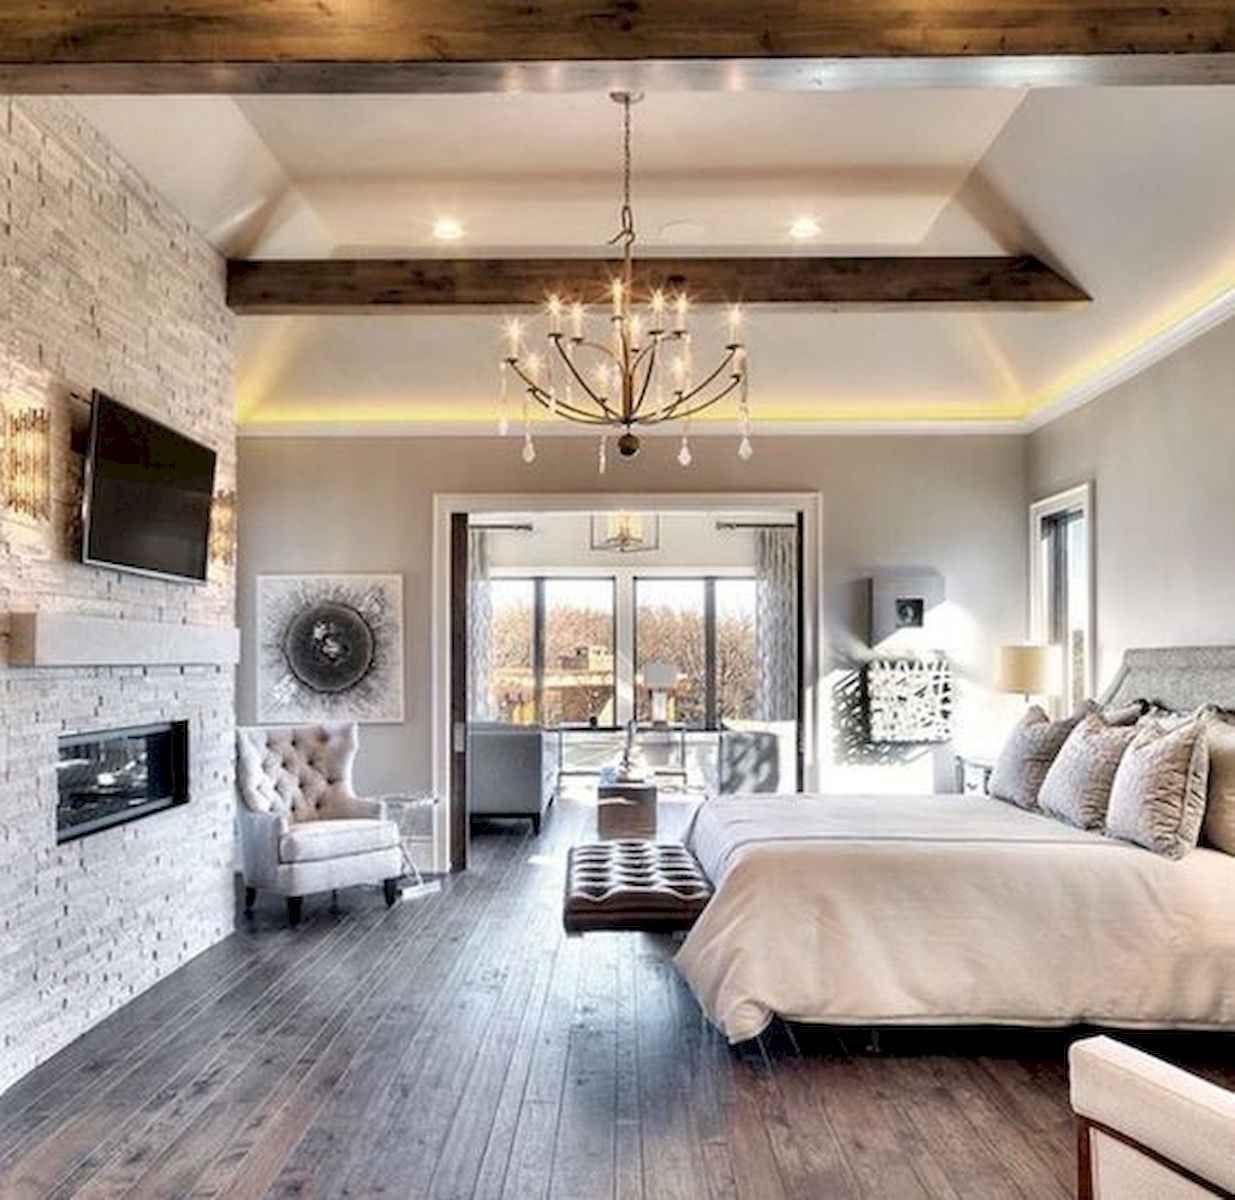 110 Home Decor For Farmhouse Master Bedroom Ideas Dream Master Bedroom Beautiful Bedrooms Master Romantic Master Bedroom